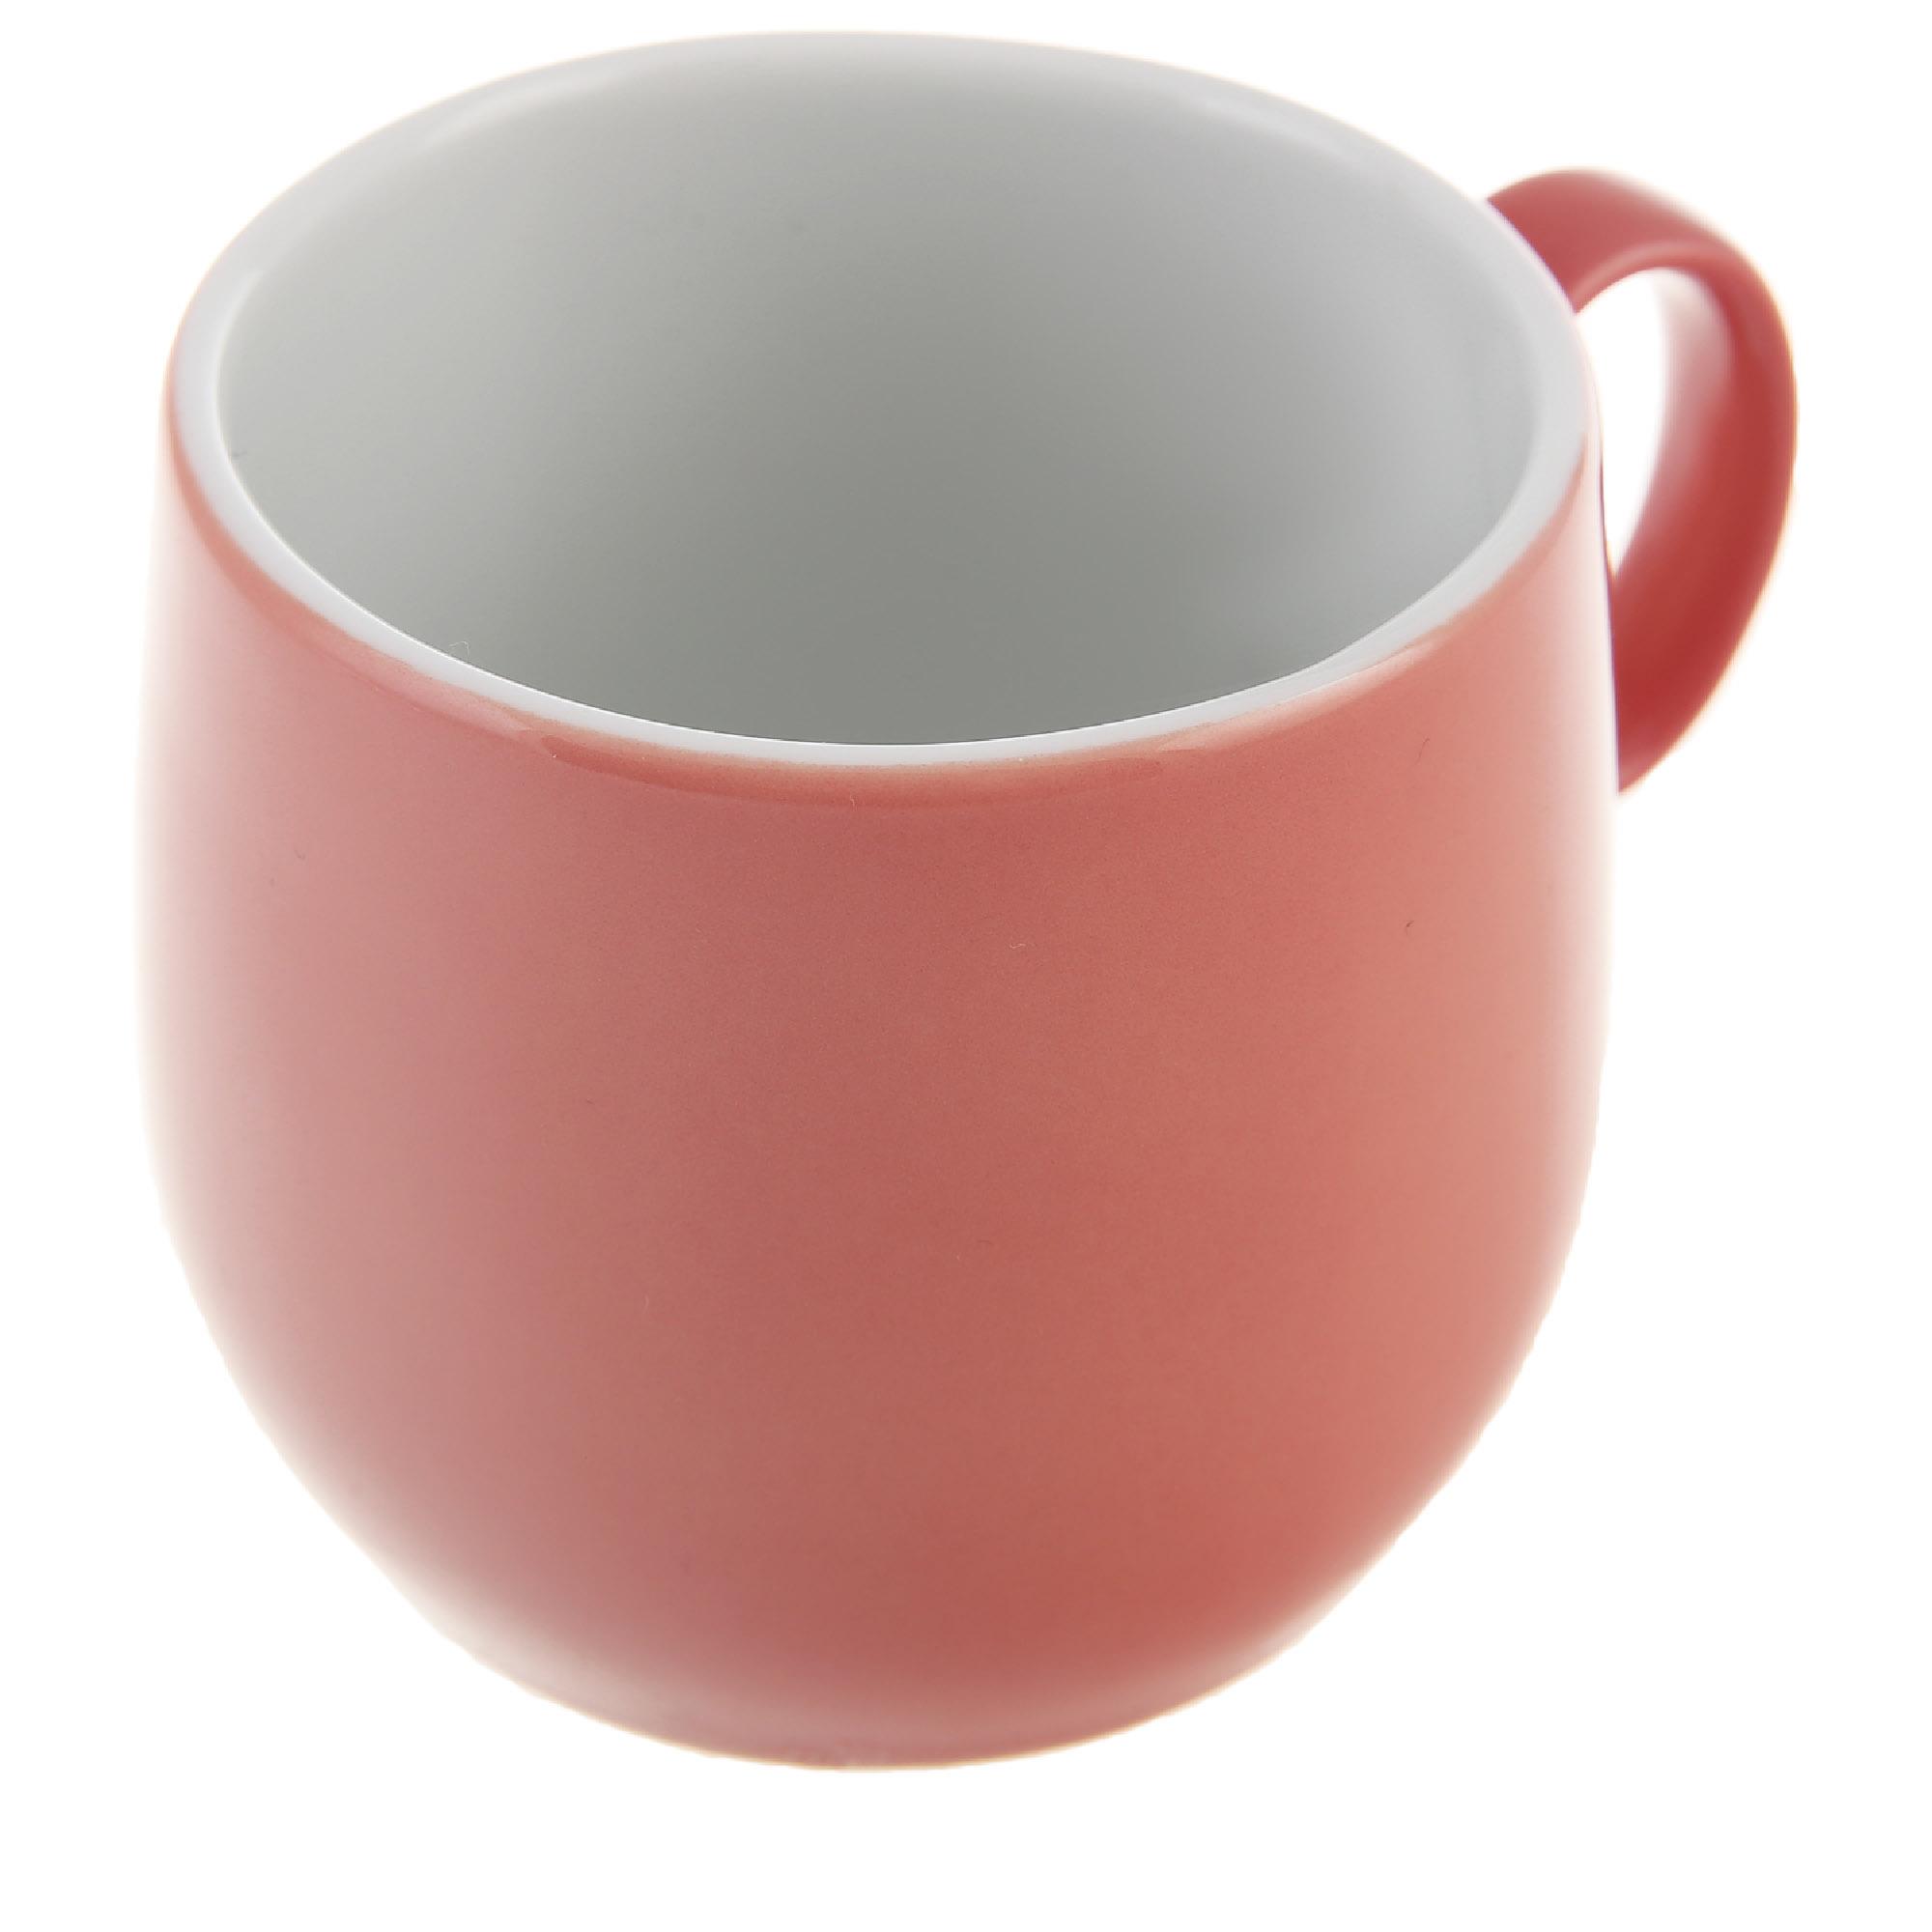 Чашка чайная 220мл Rose de sable yaka rose 2228